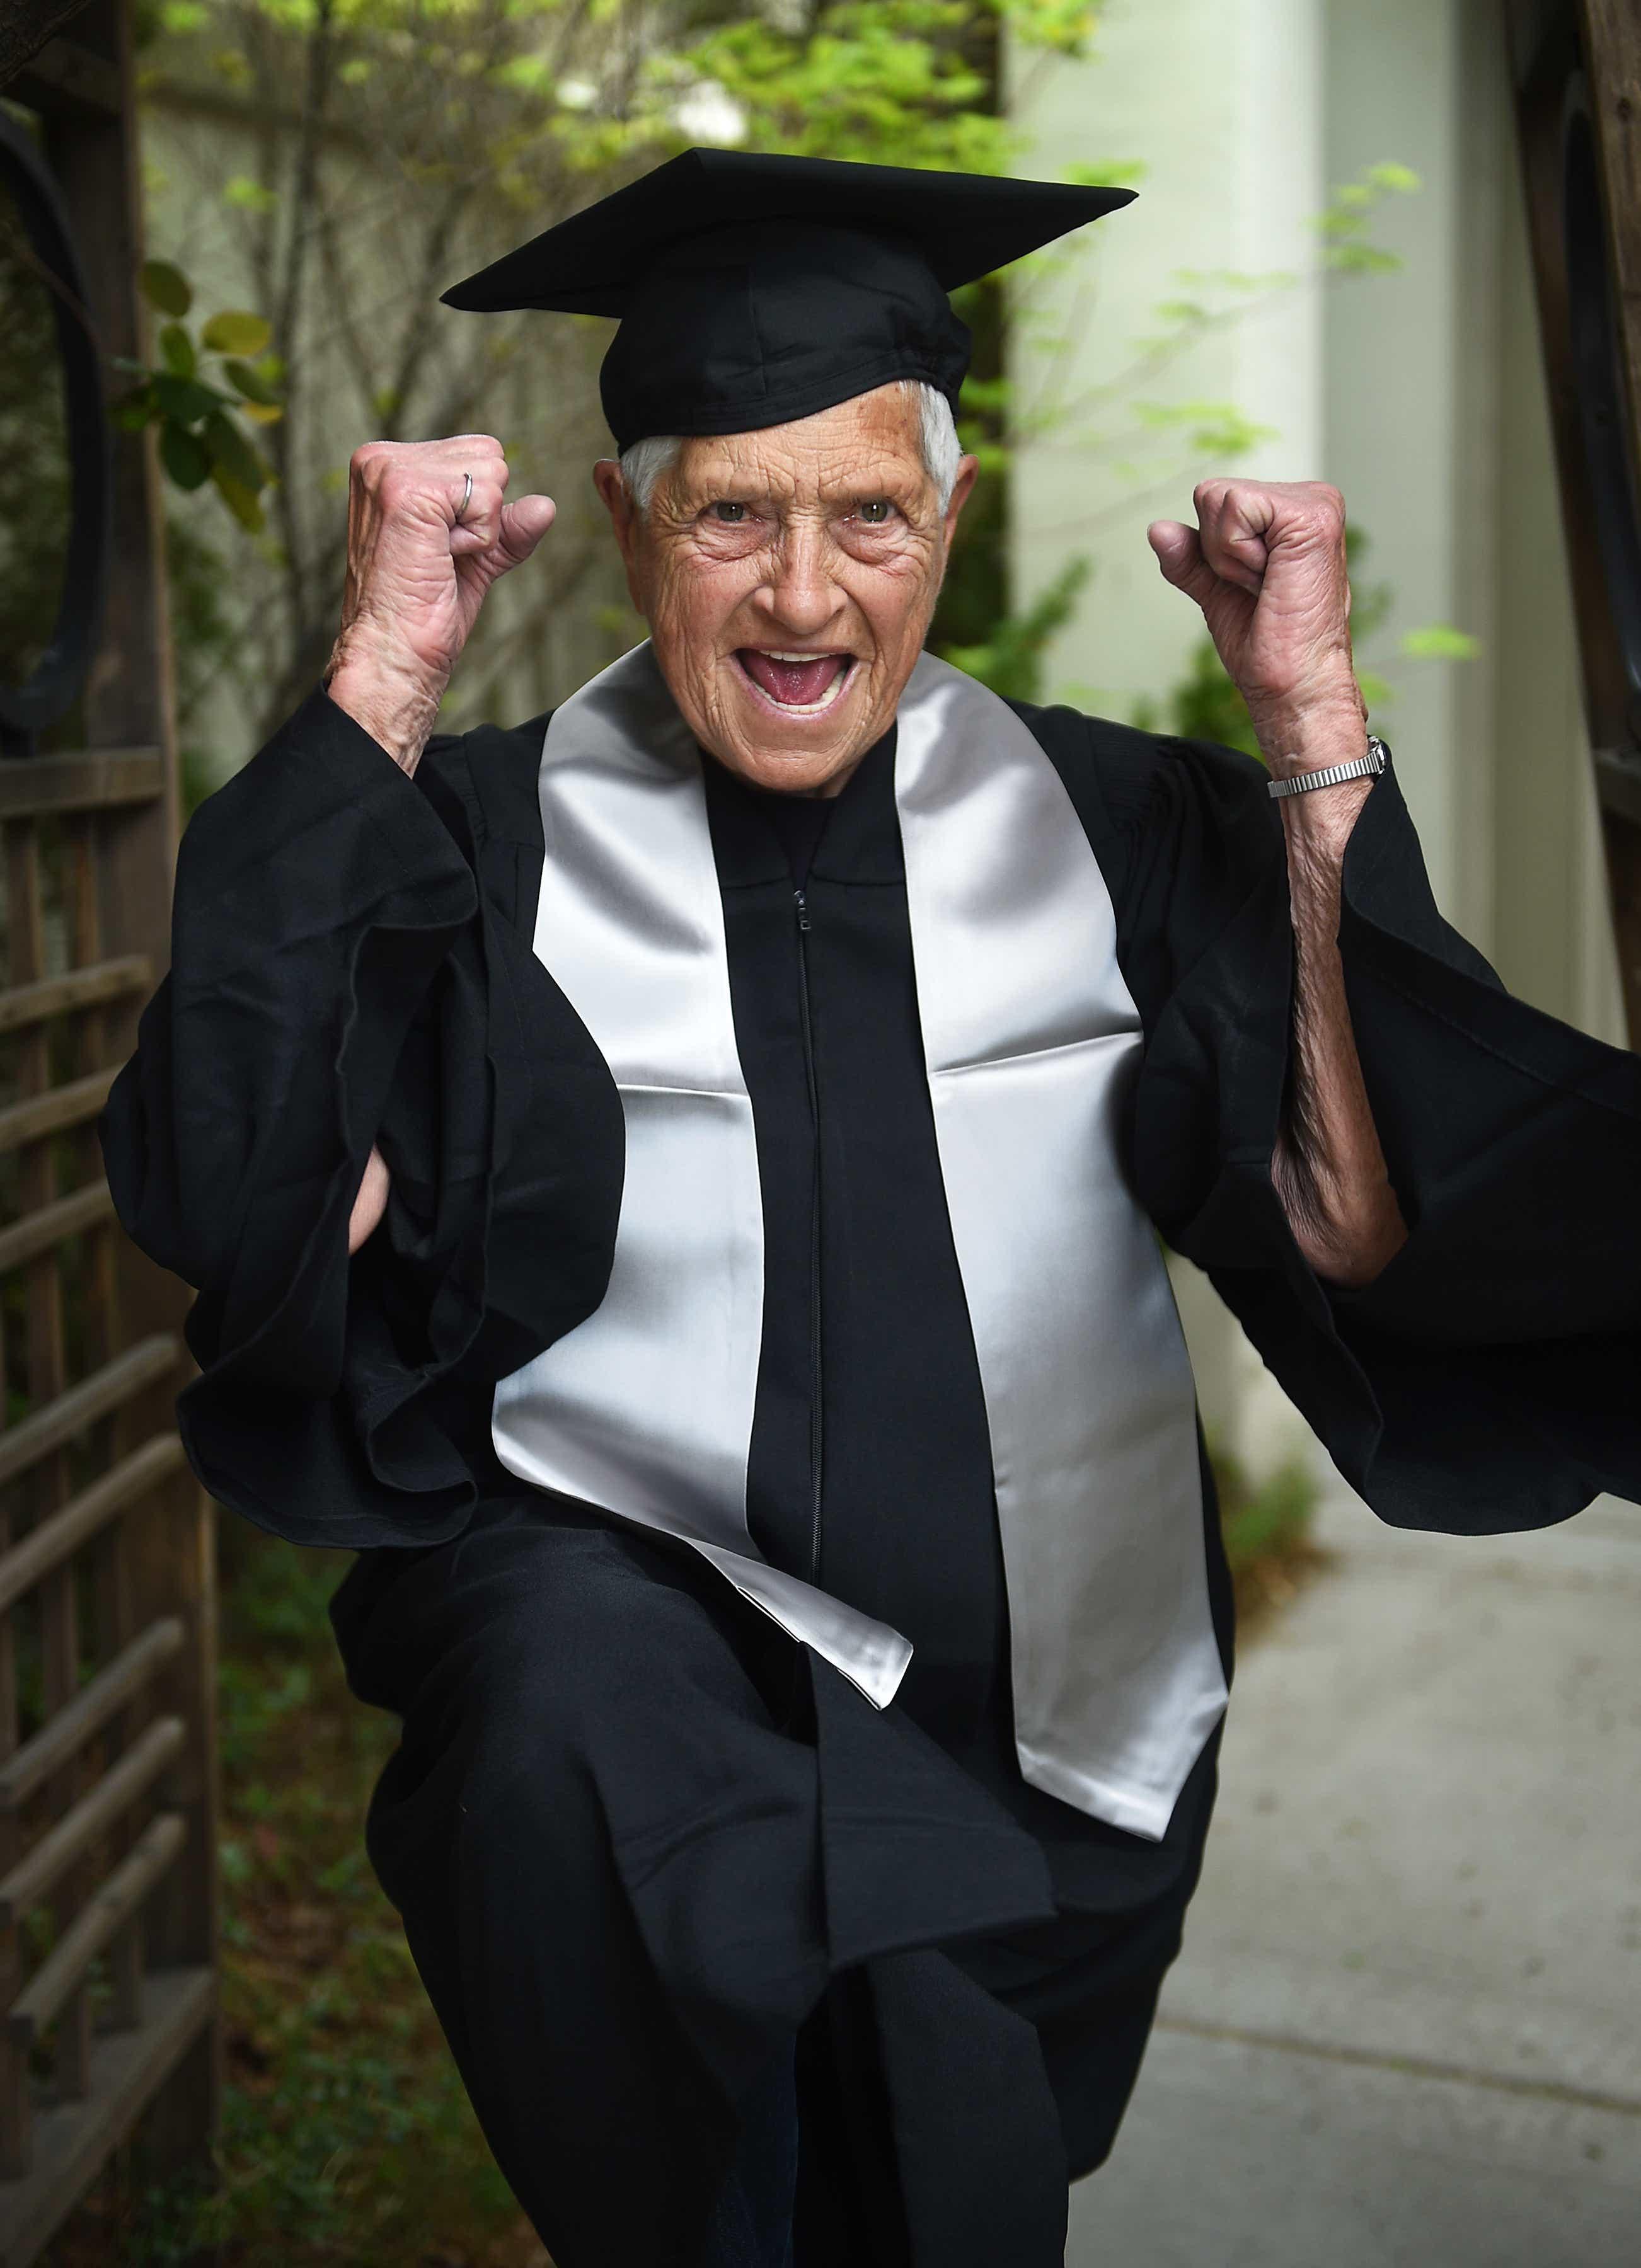 Unr Spring Graduation 2020.Watch 90 Year Old Dorismae Weber Finally Walks For Unr Diploma